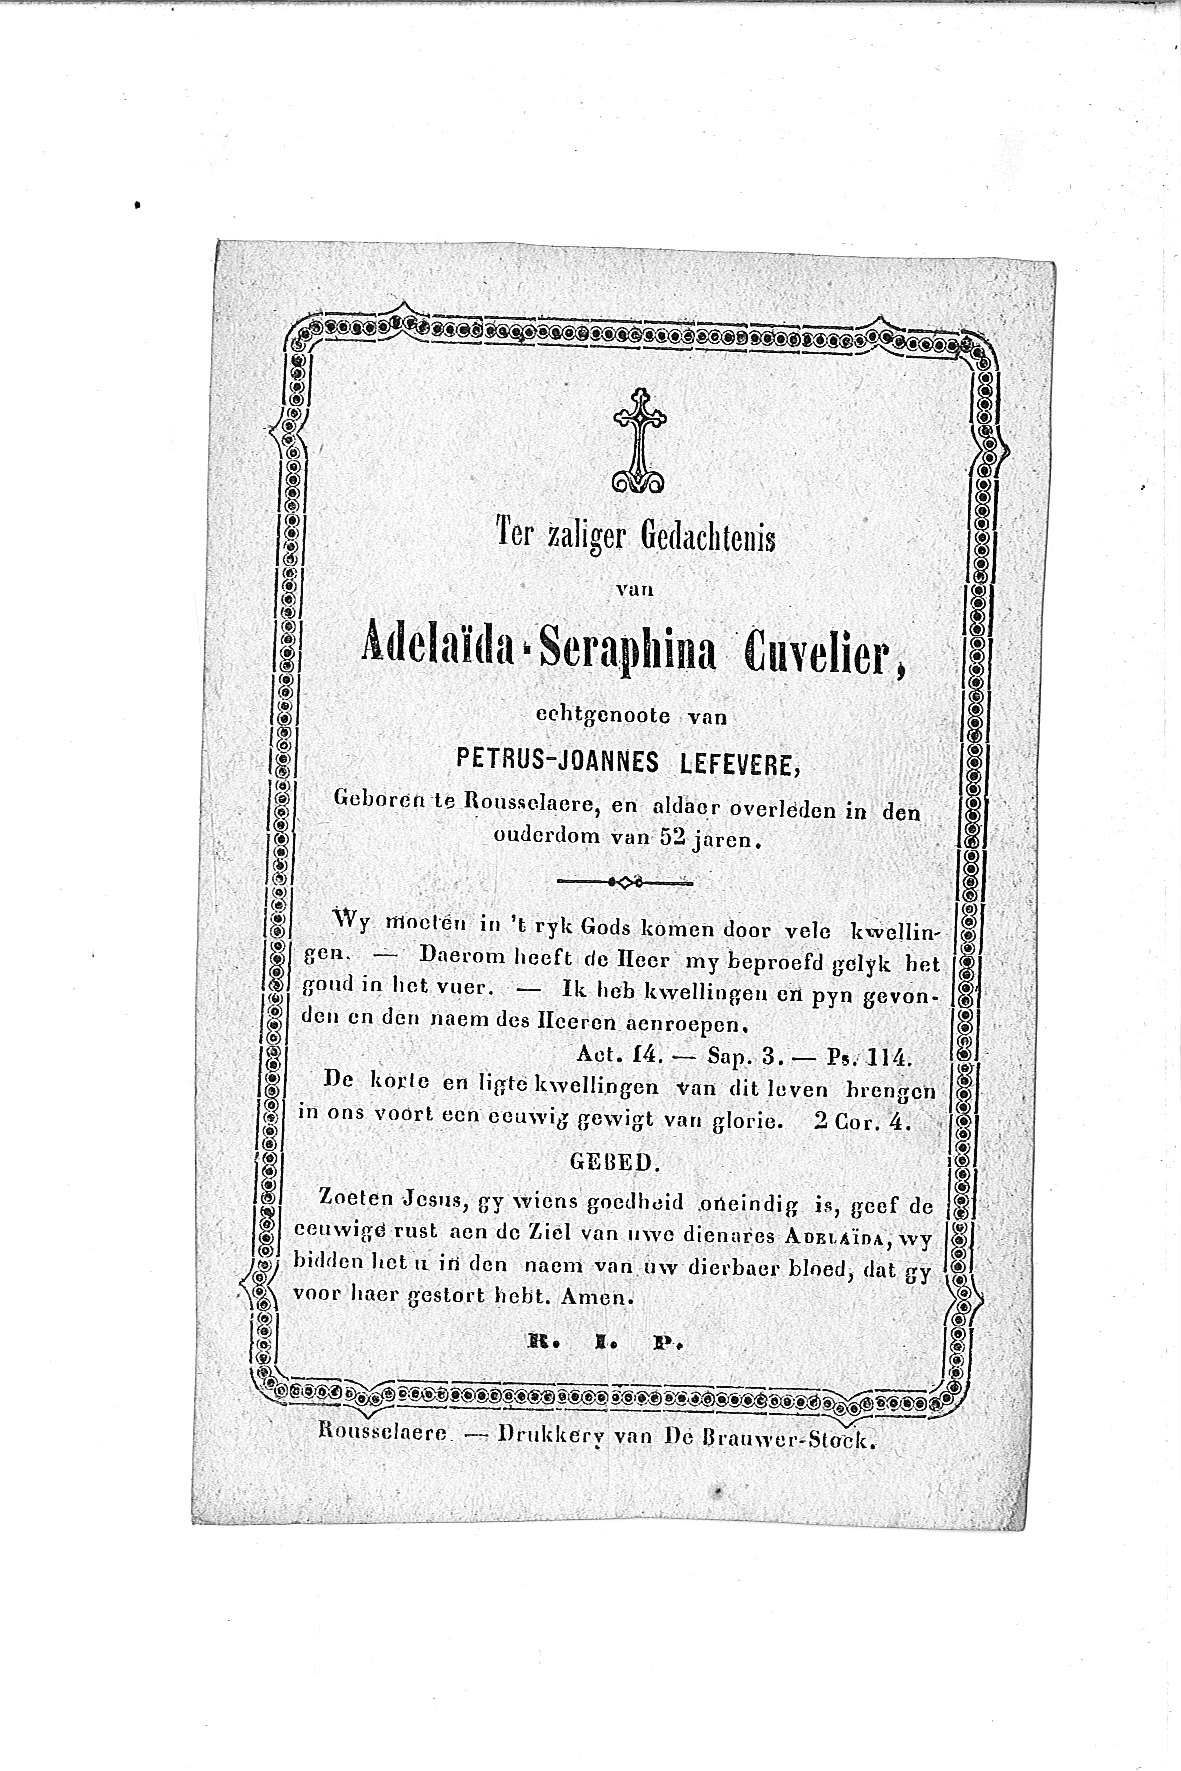 adelaïde-seraphina(-)20120329074916_00007.jpg